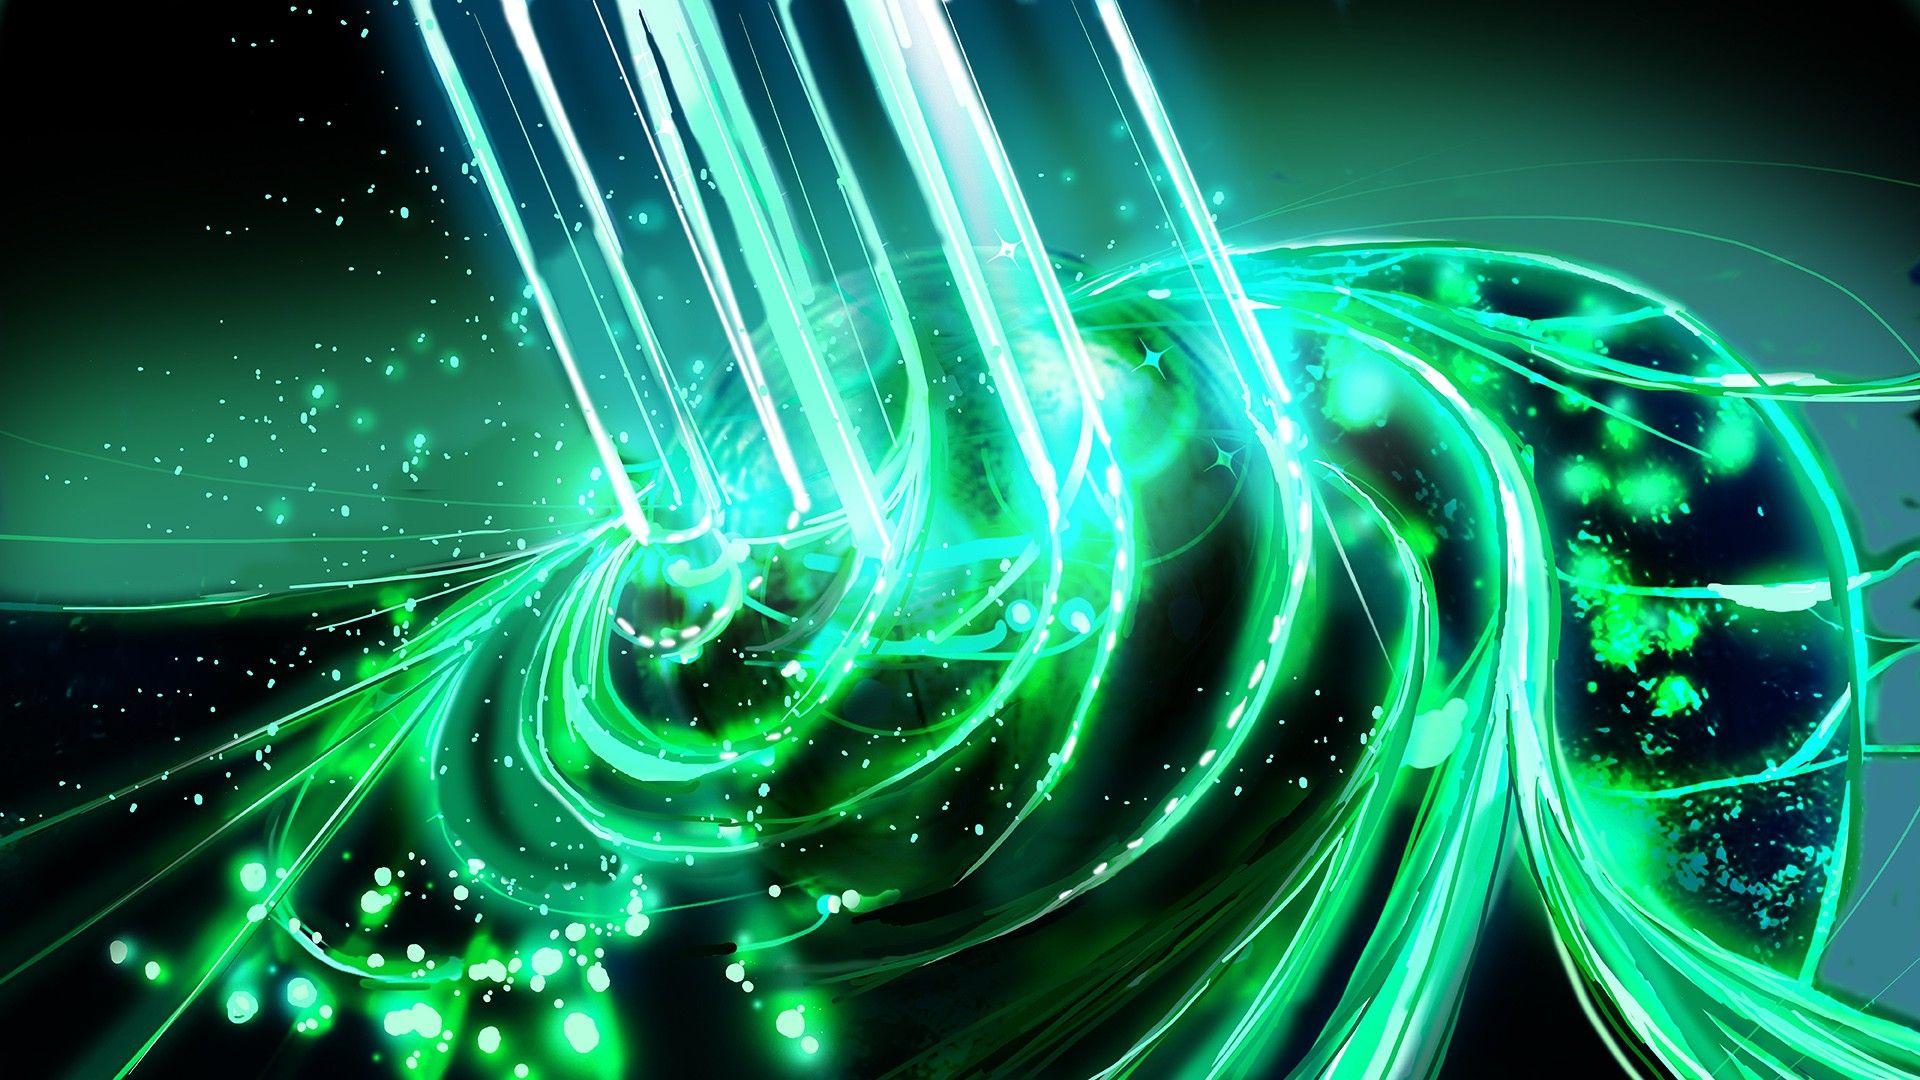 Cool Green wallpaper 1080p